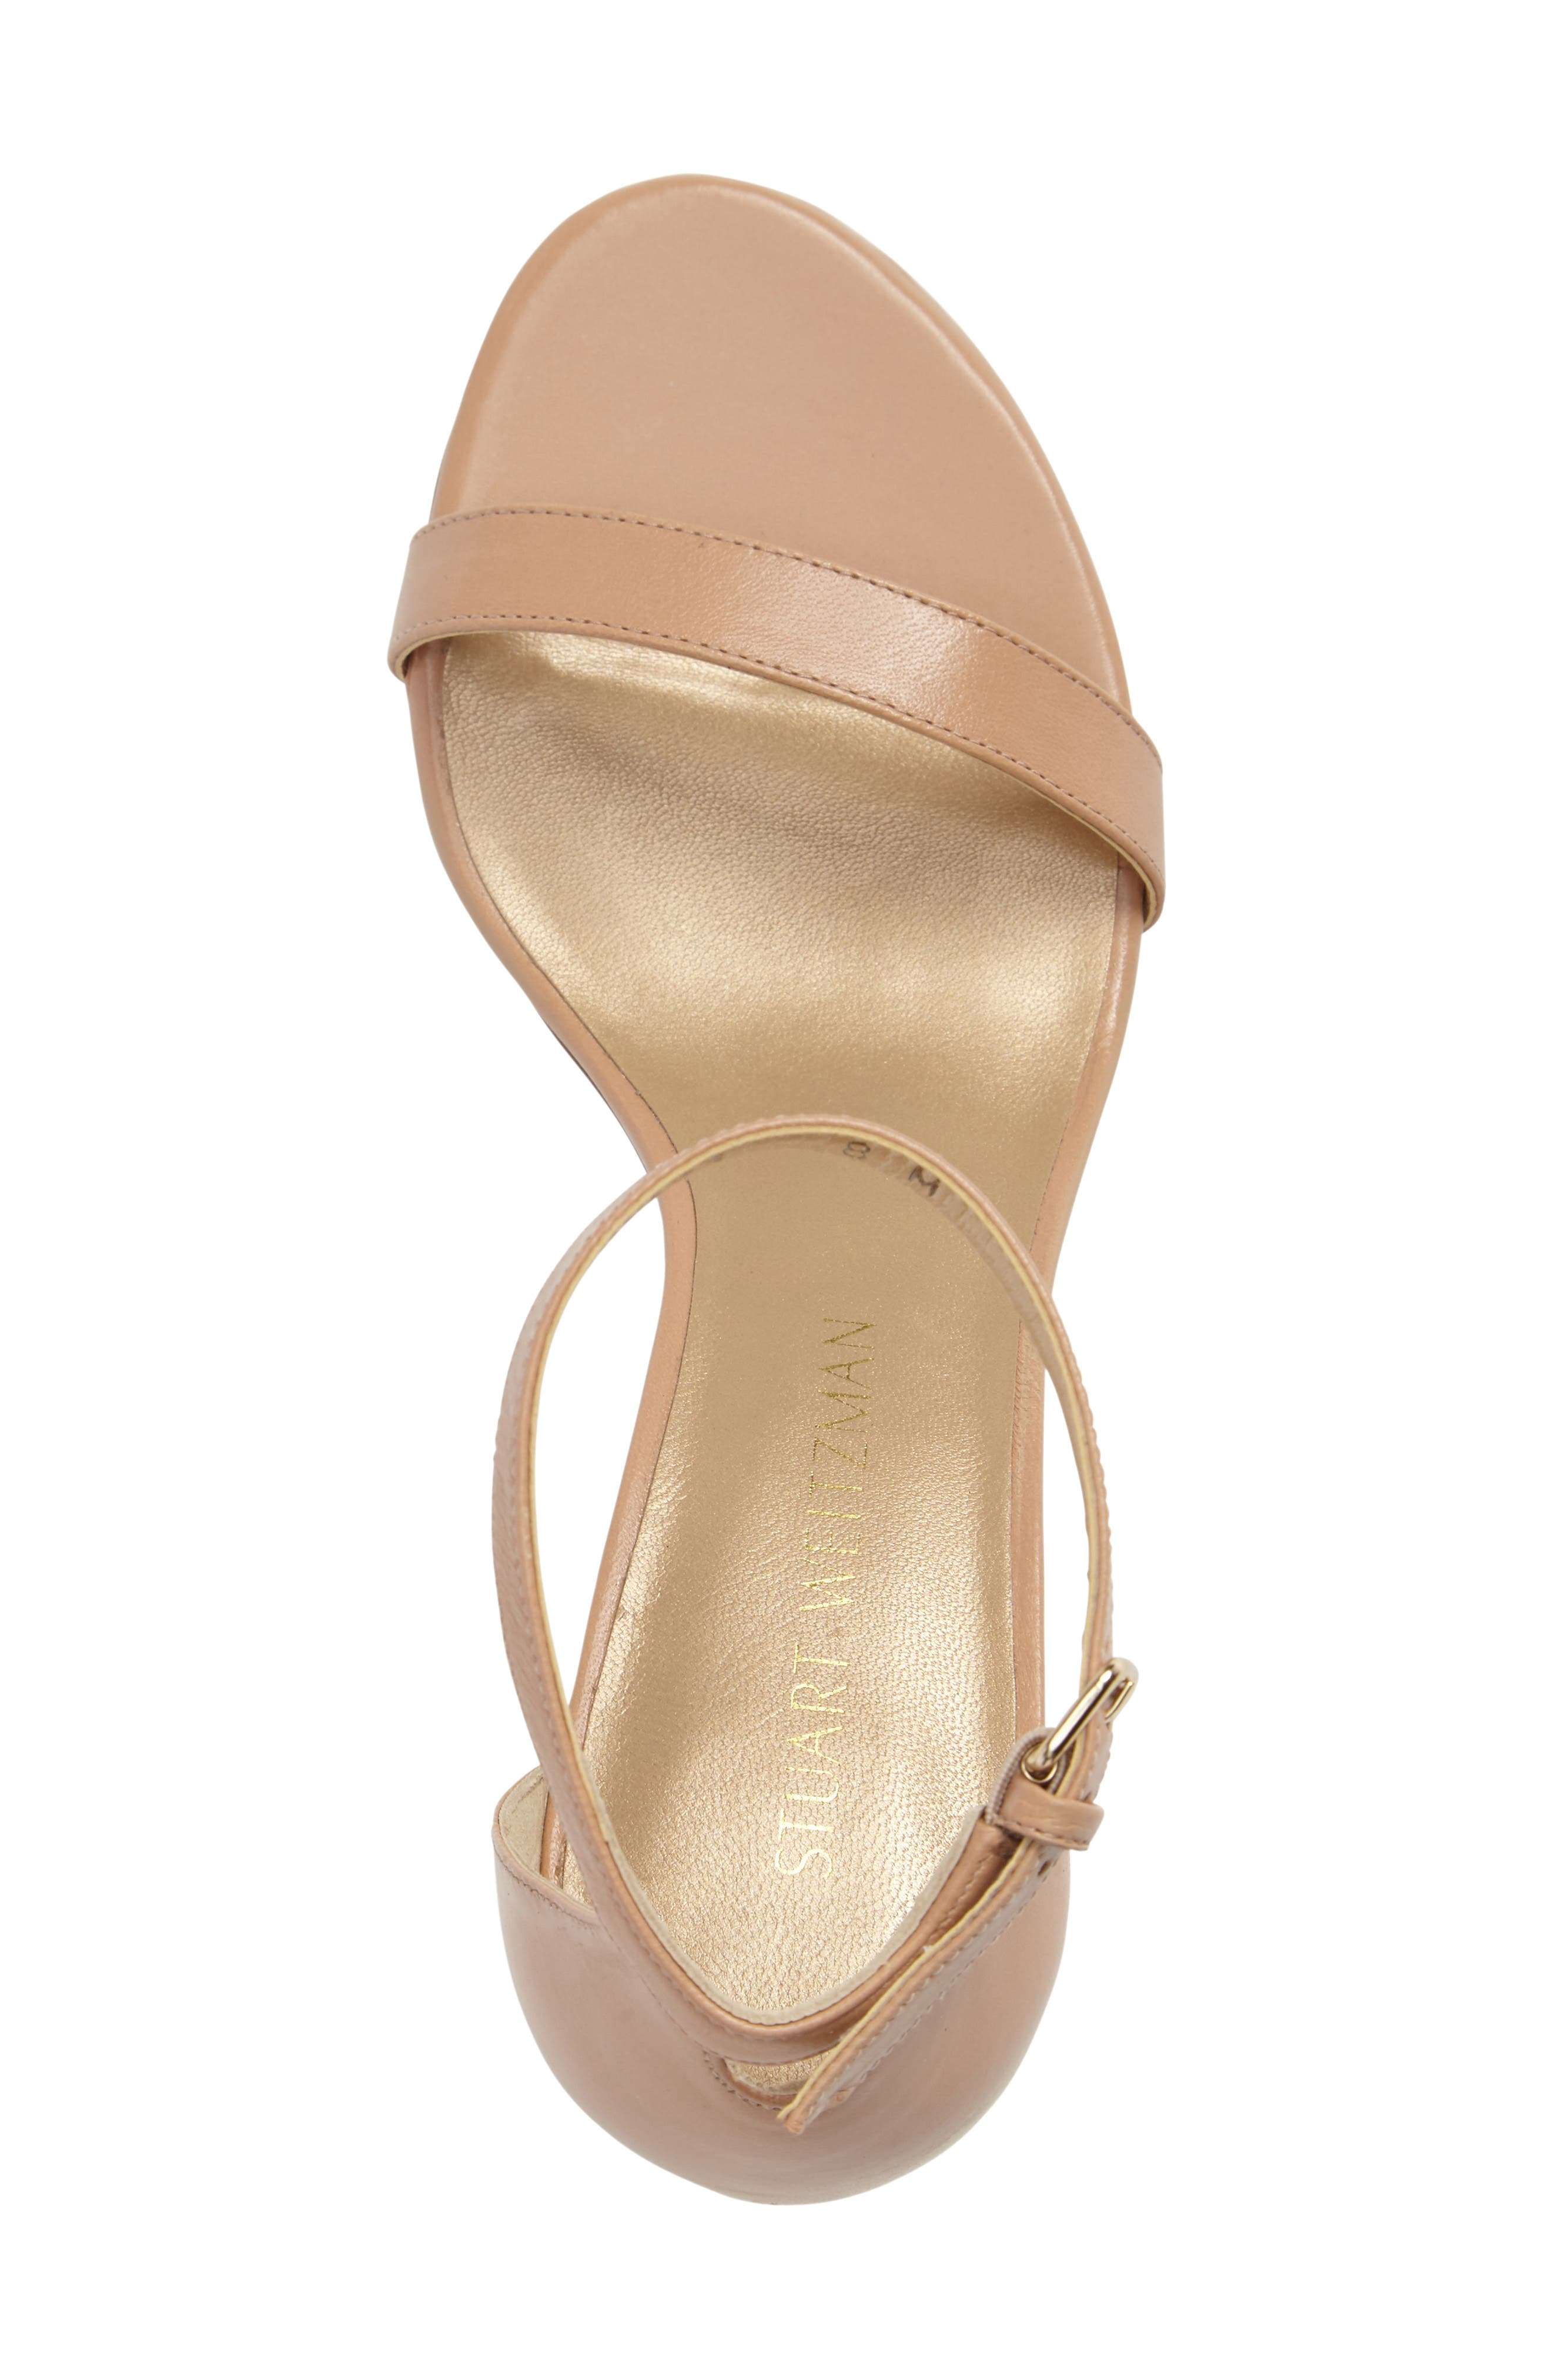 NearlyNude Ankle Strap Sandal,                             Alternate thumbnail 3, color,                             Bambina Nappa